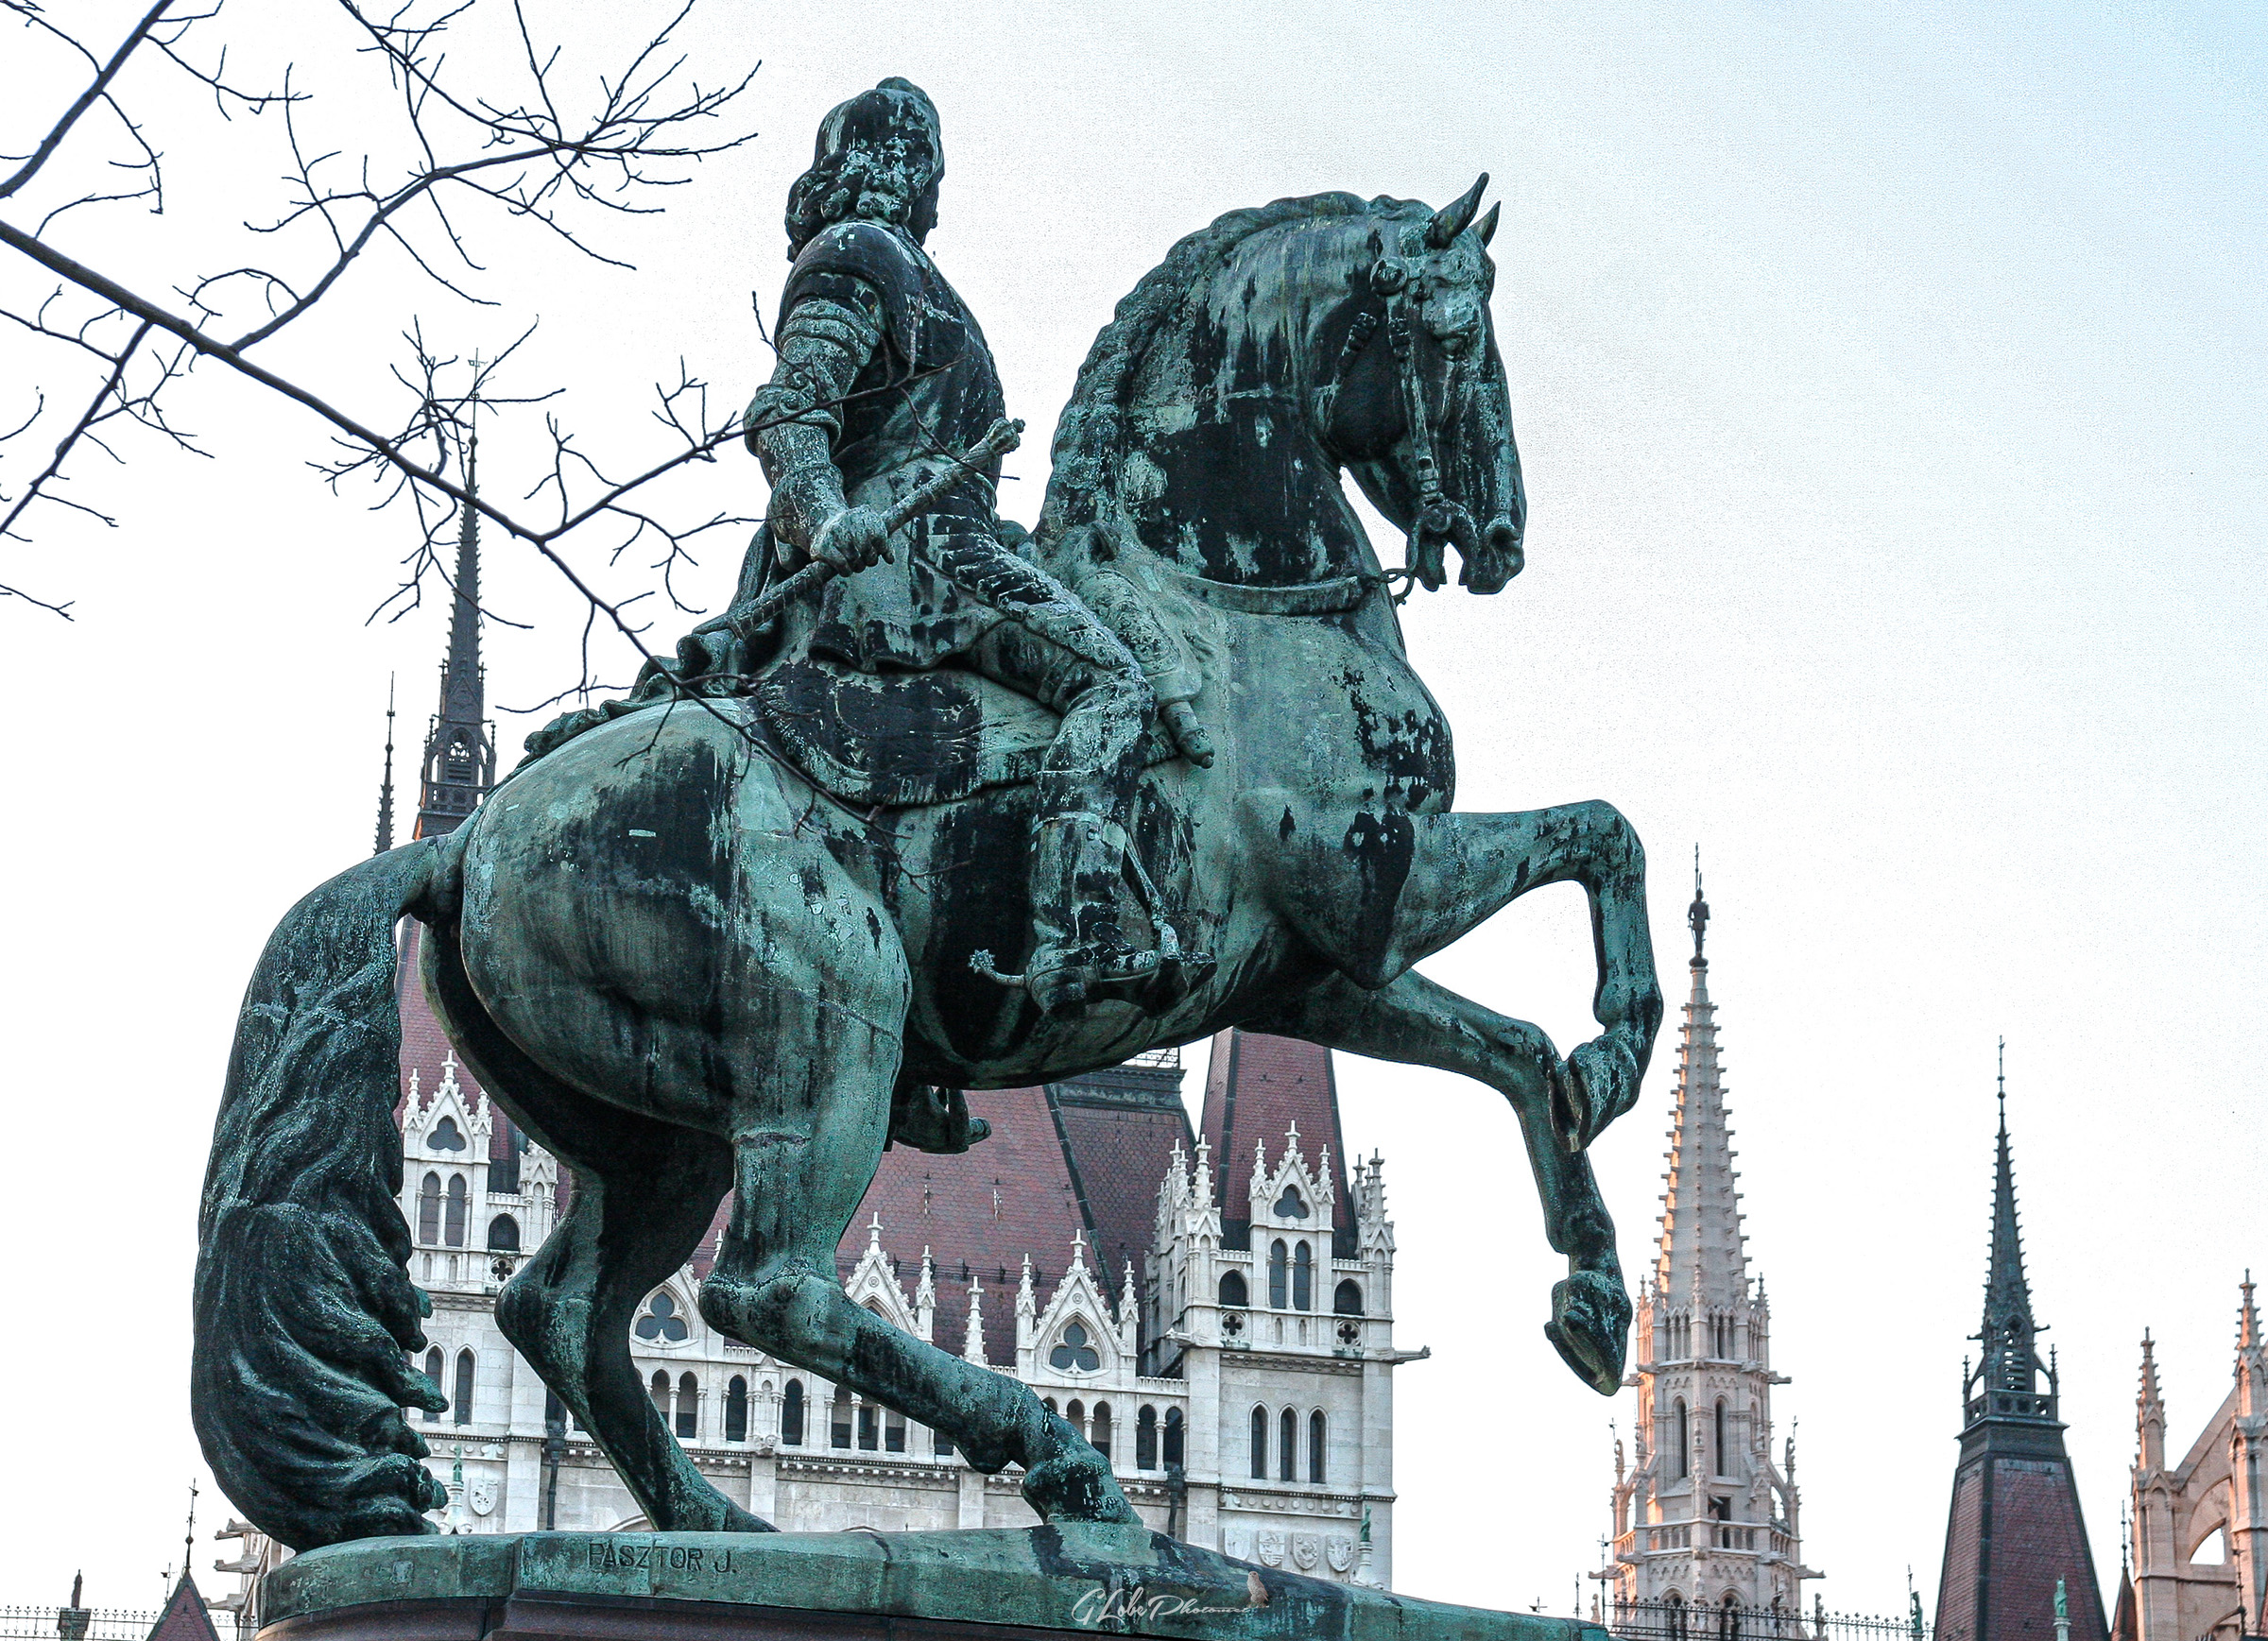 Equestrian statue near the Parliament